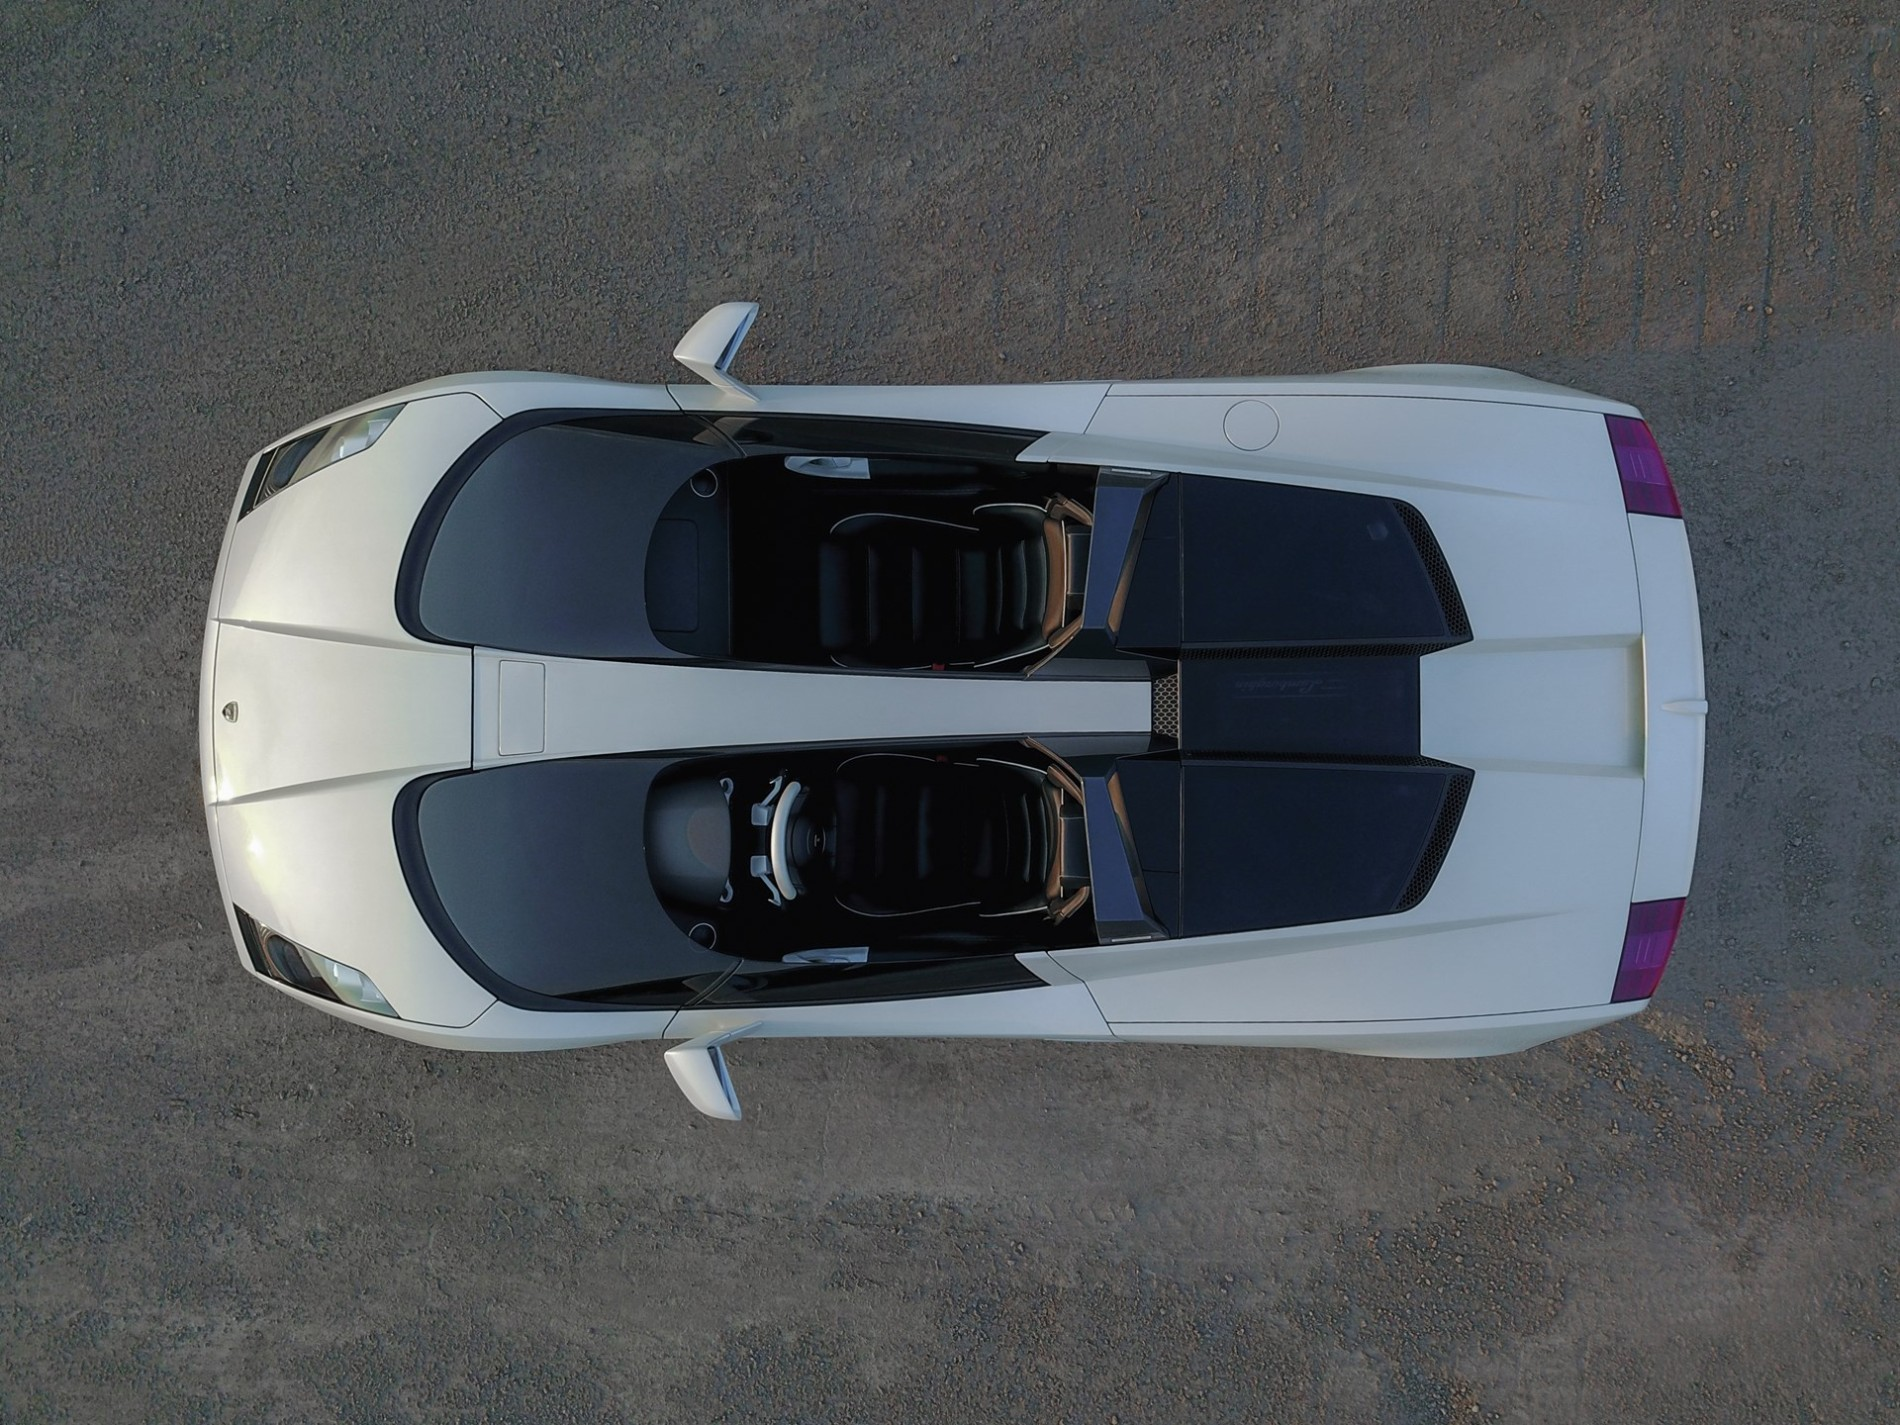 Lamborghini Concept S - Lamborghini Concept S